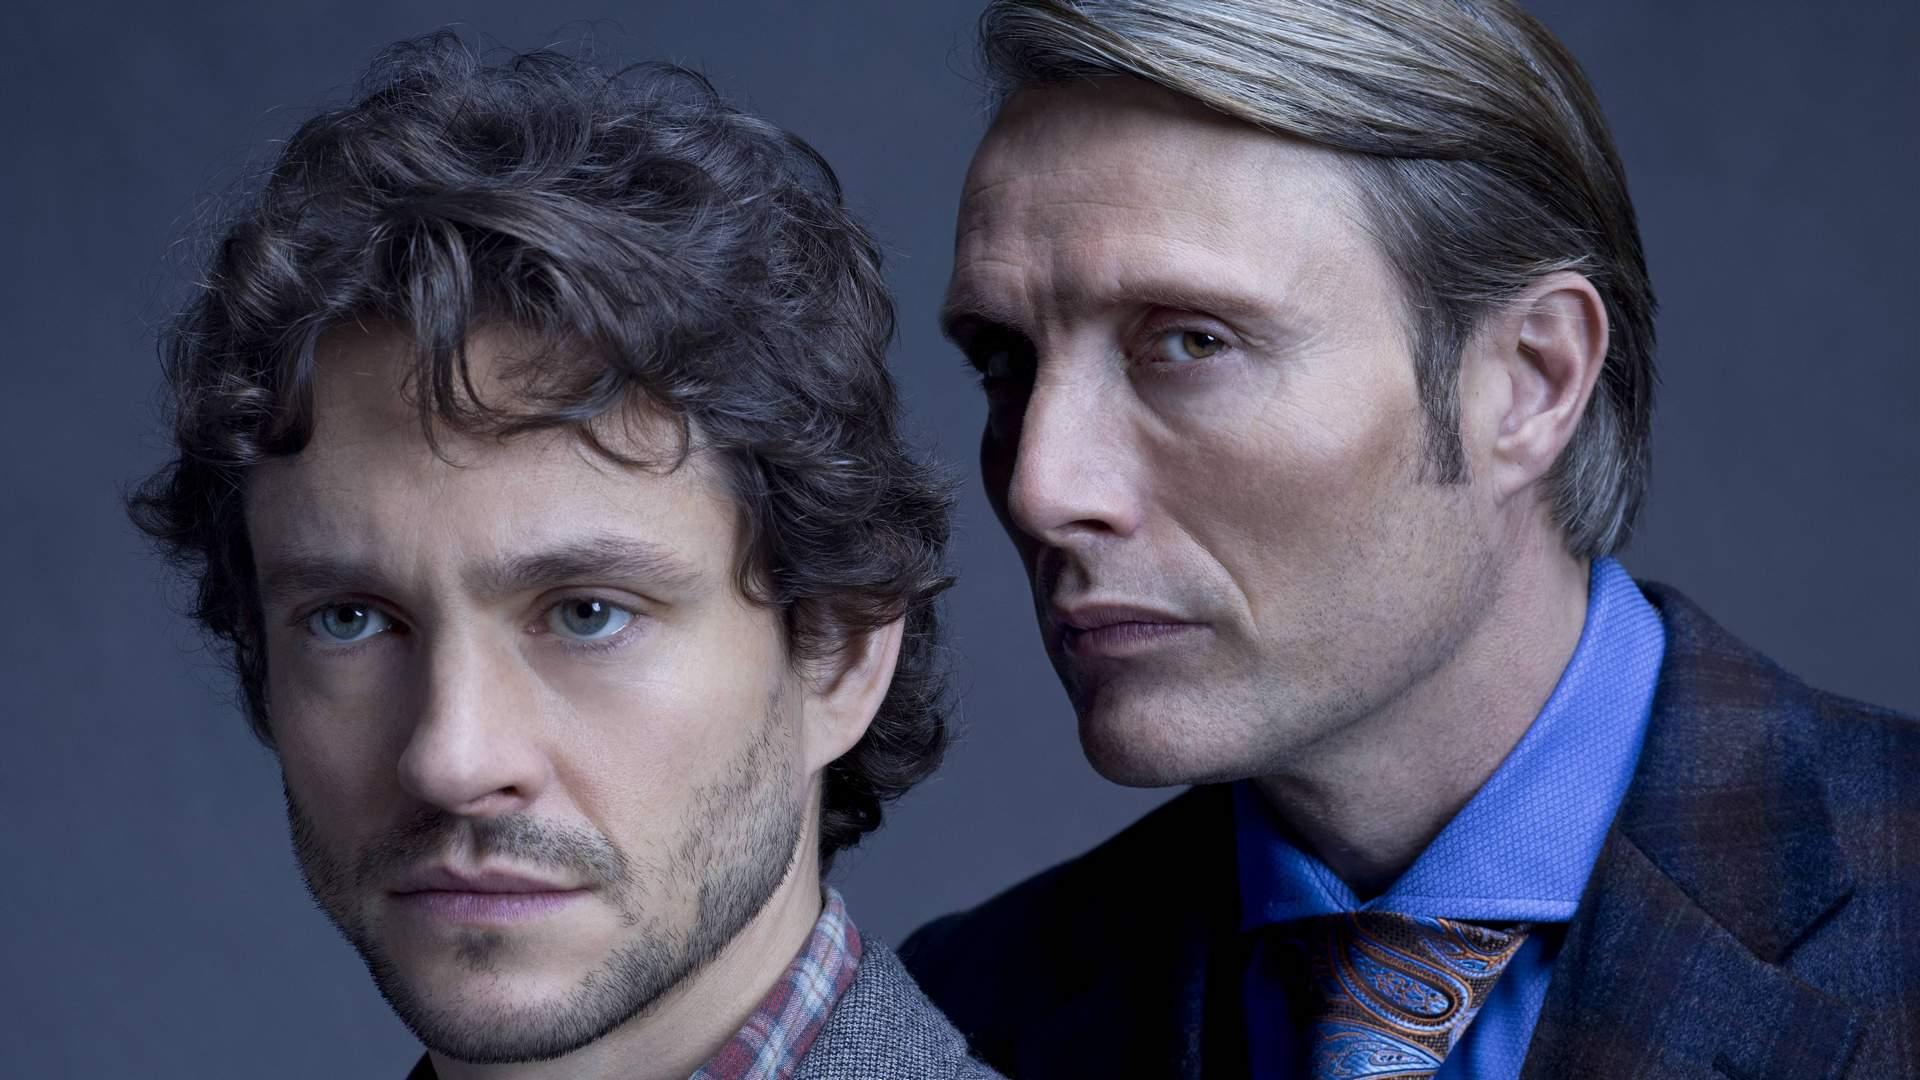 Hannibal Season 4 Update